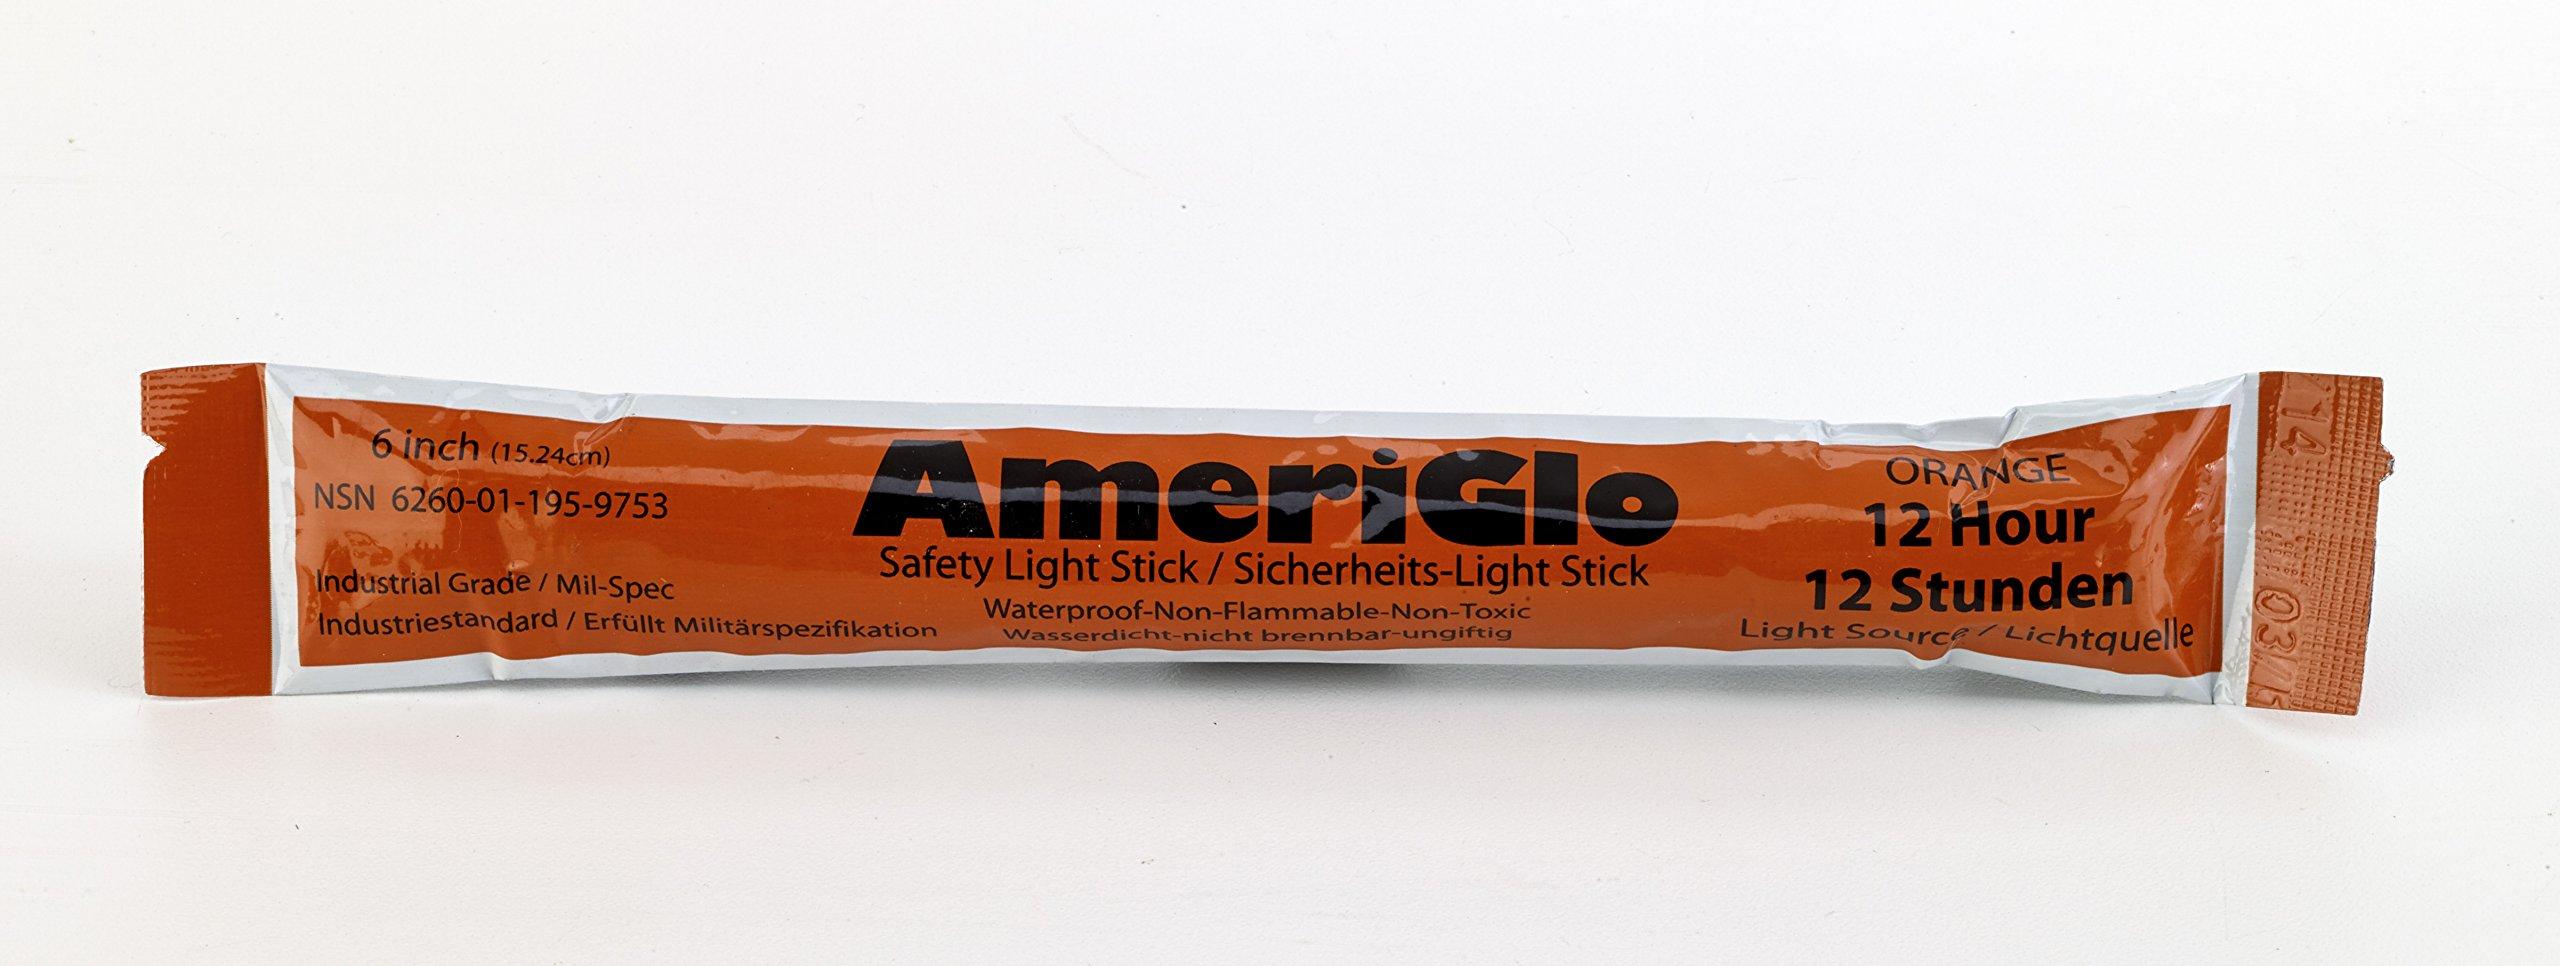 Cyalume 12 Hours Lightstick, 6'' Length, Orange (PA